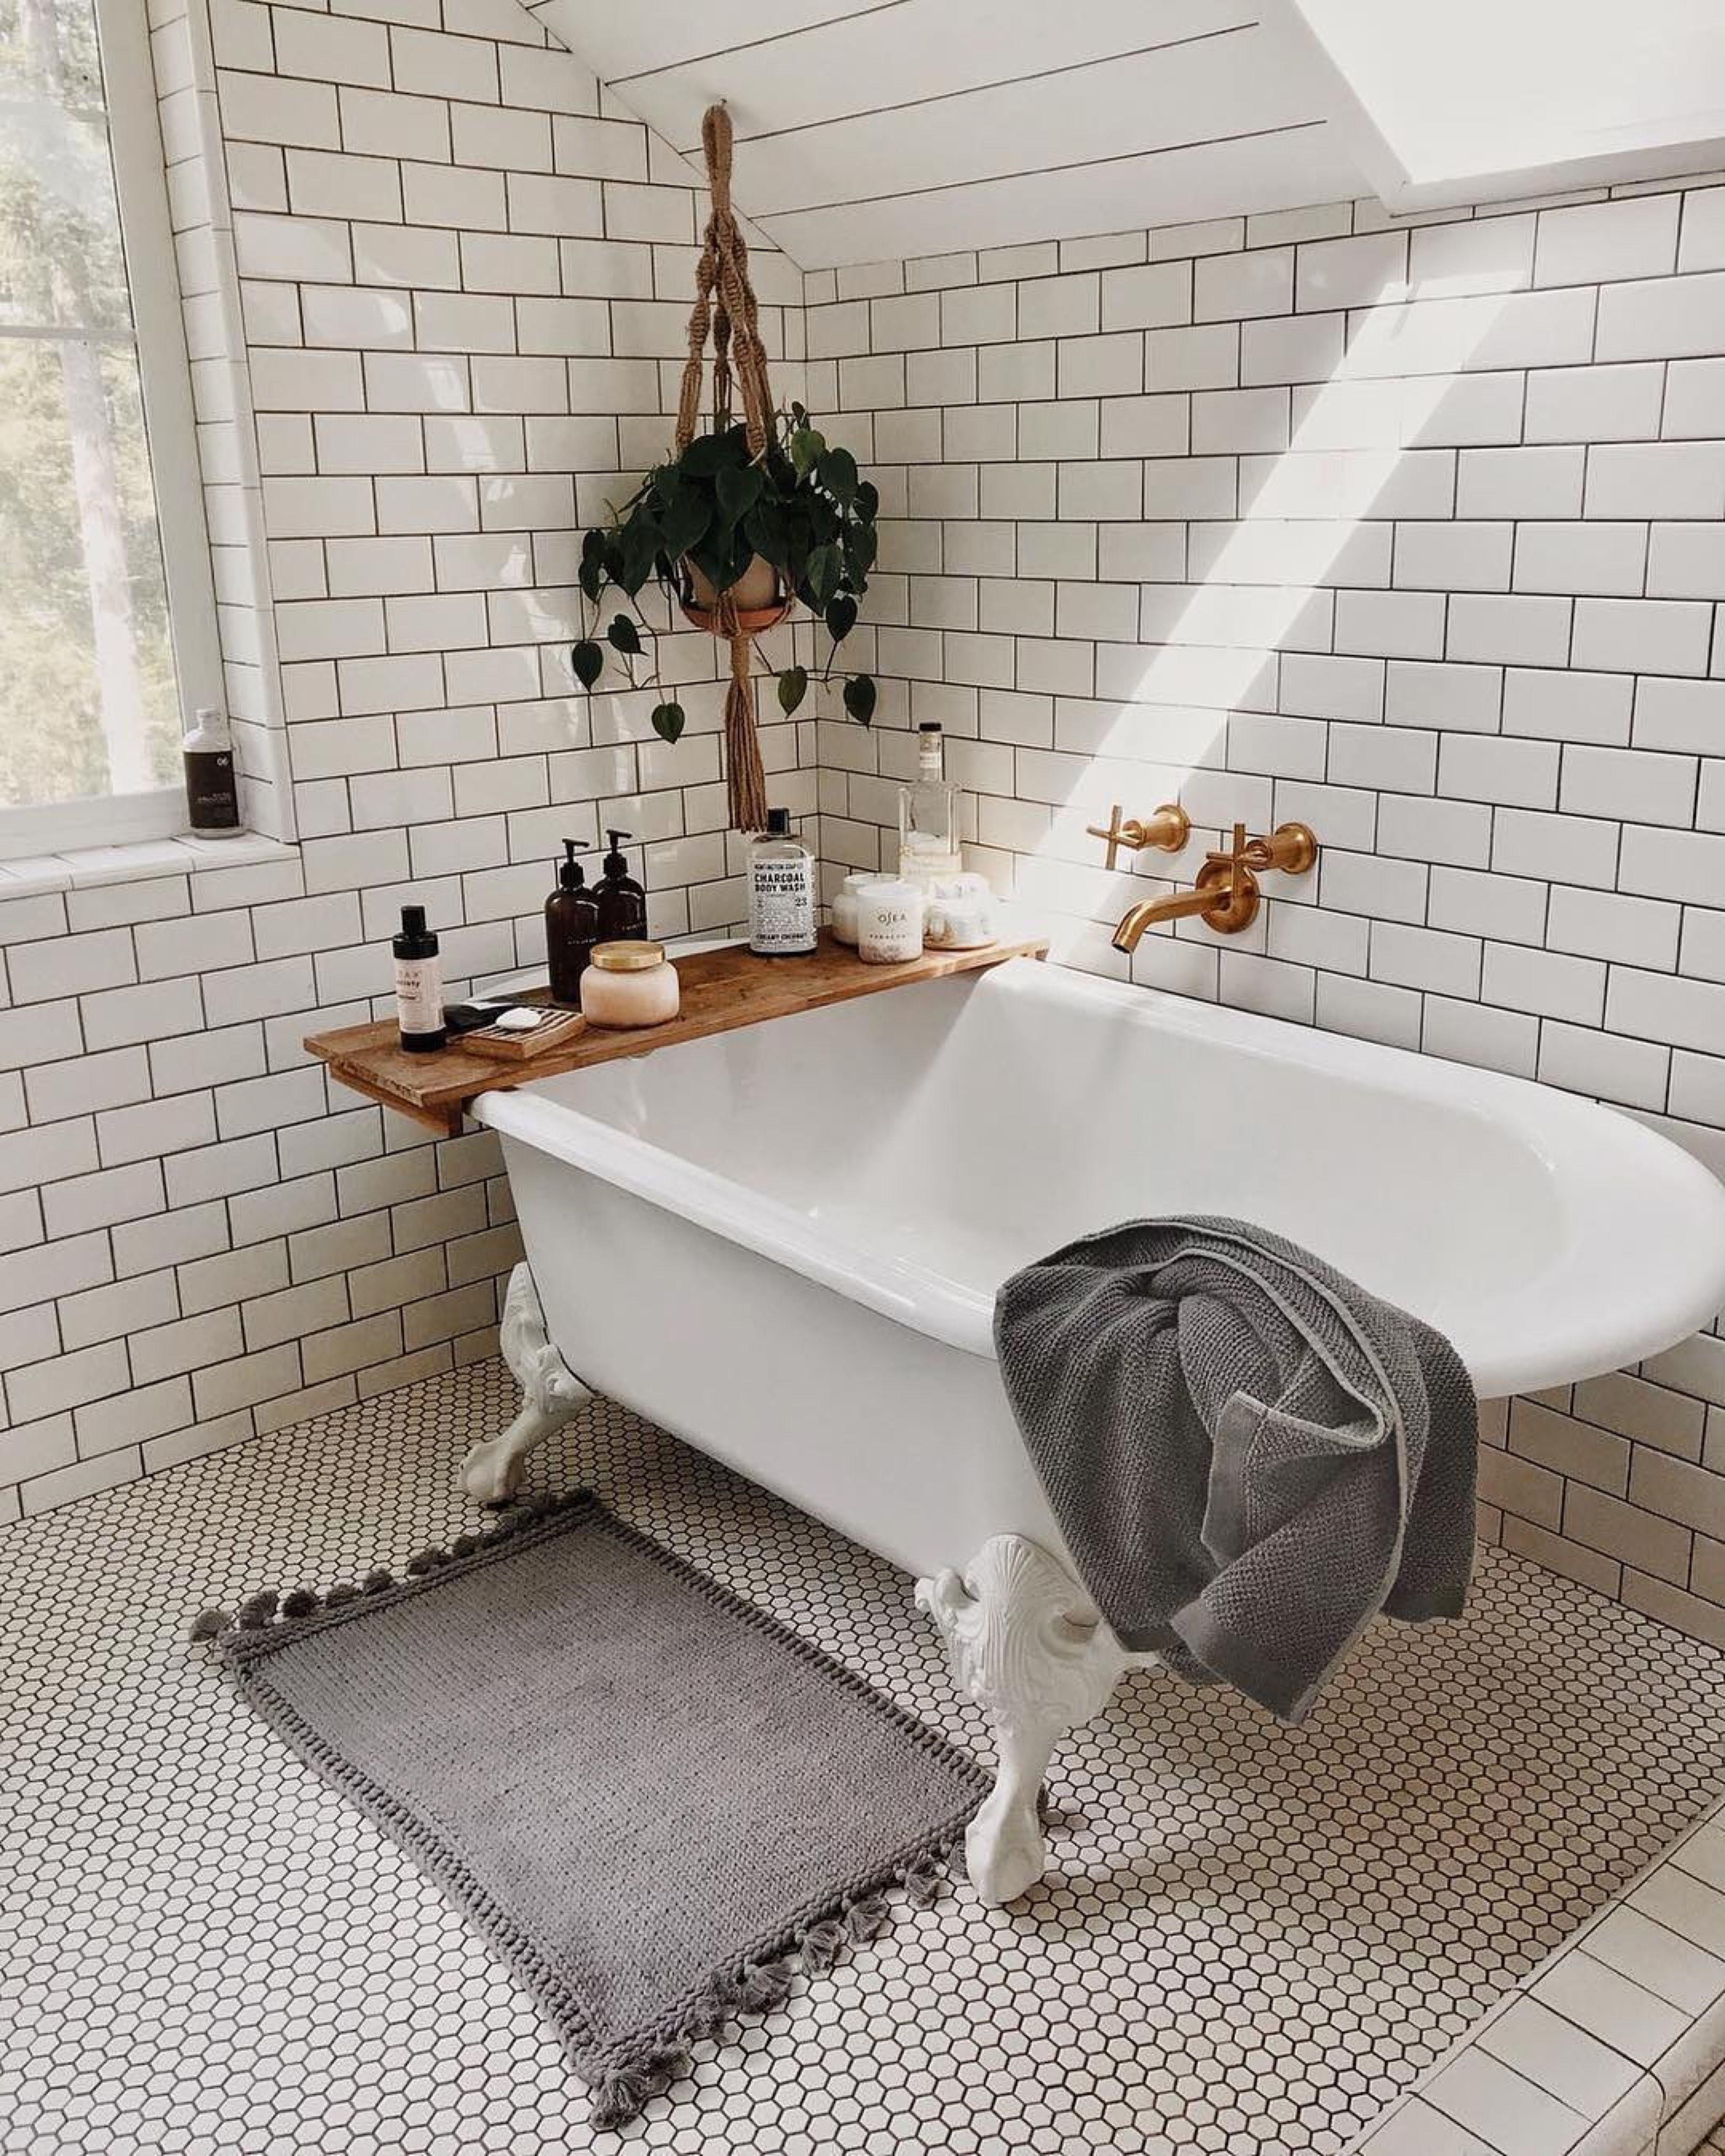 5 Gorgeous Scandinavian Bathroom Ideas: Home, House Design, Home Decor